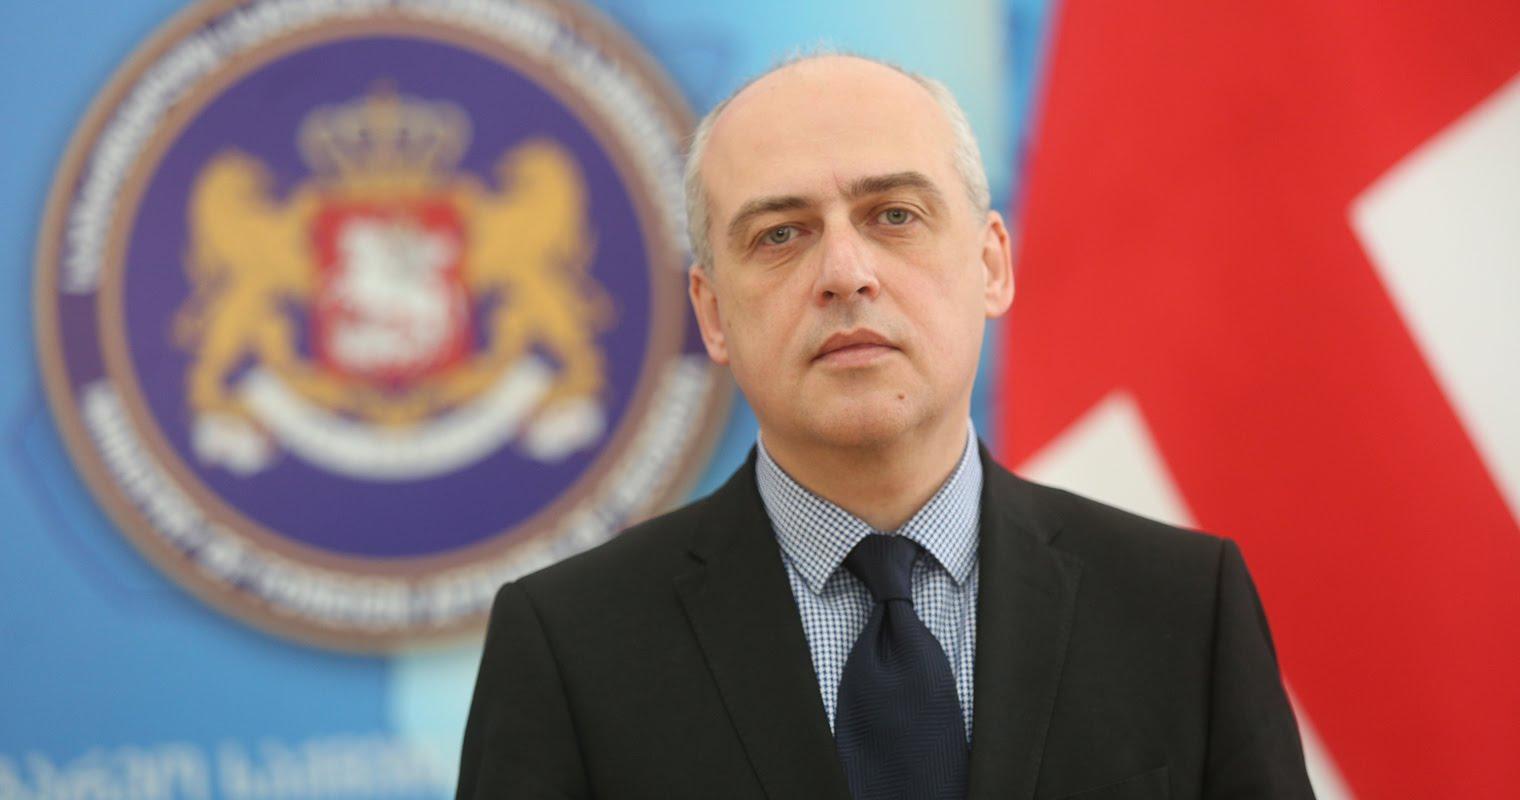 Davit Zalkaliani #новости Давид Залкалиани, евросоюз, зона Шенгена, коронавирус в Грузии